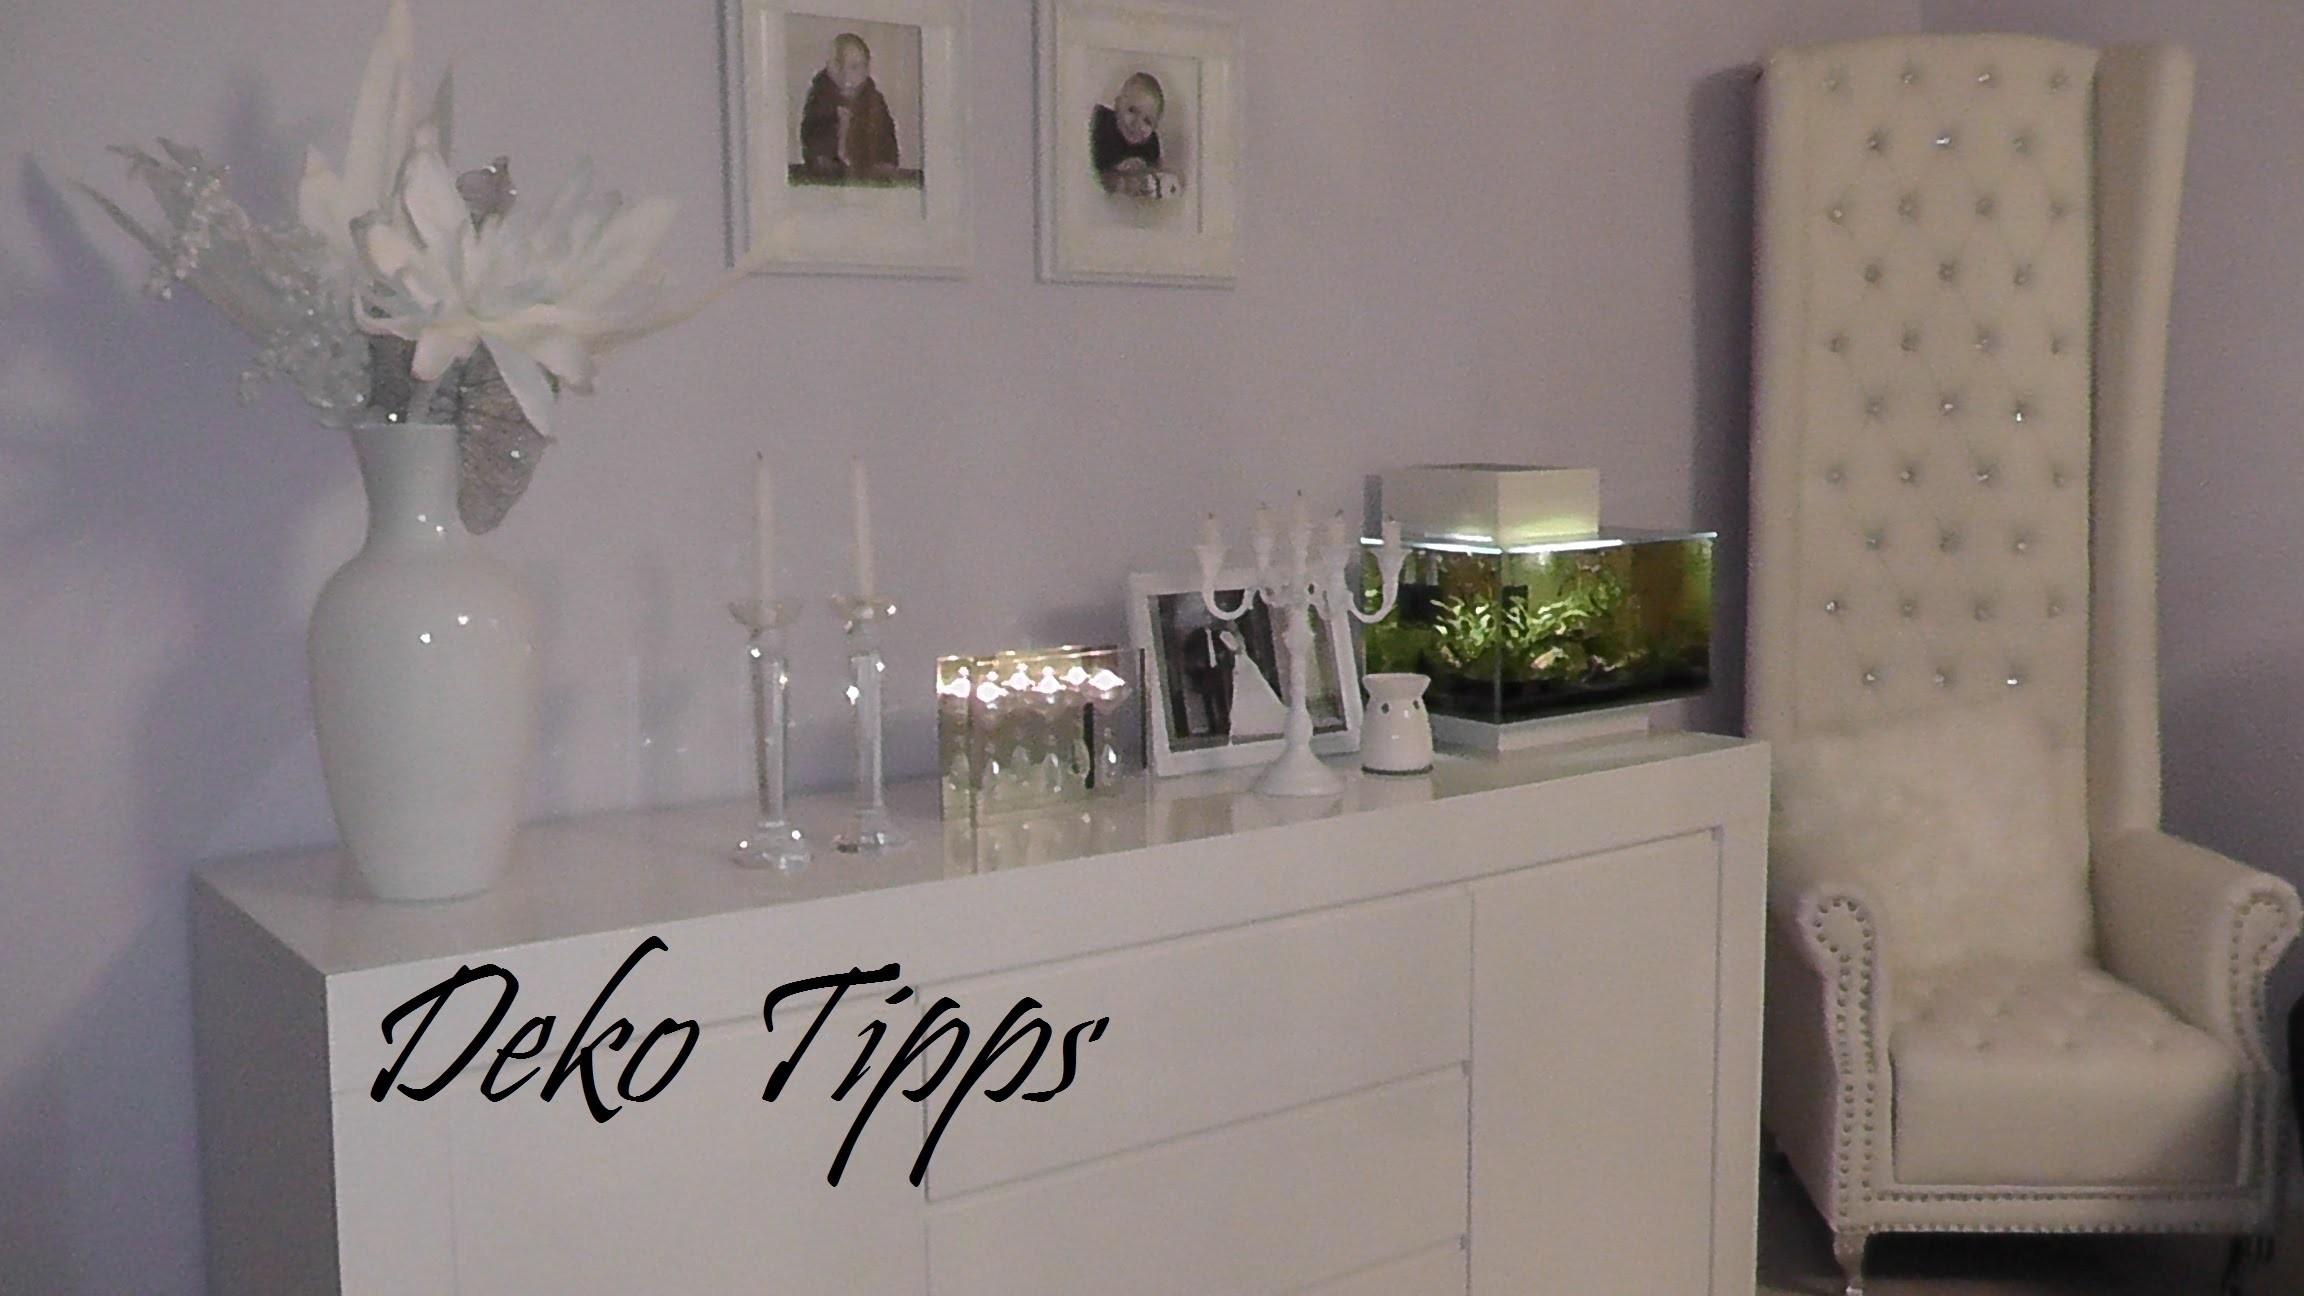 Room tour. Deko Tipps. New Home Decor, Kare,Ikea